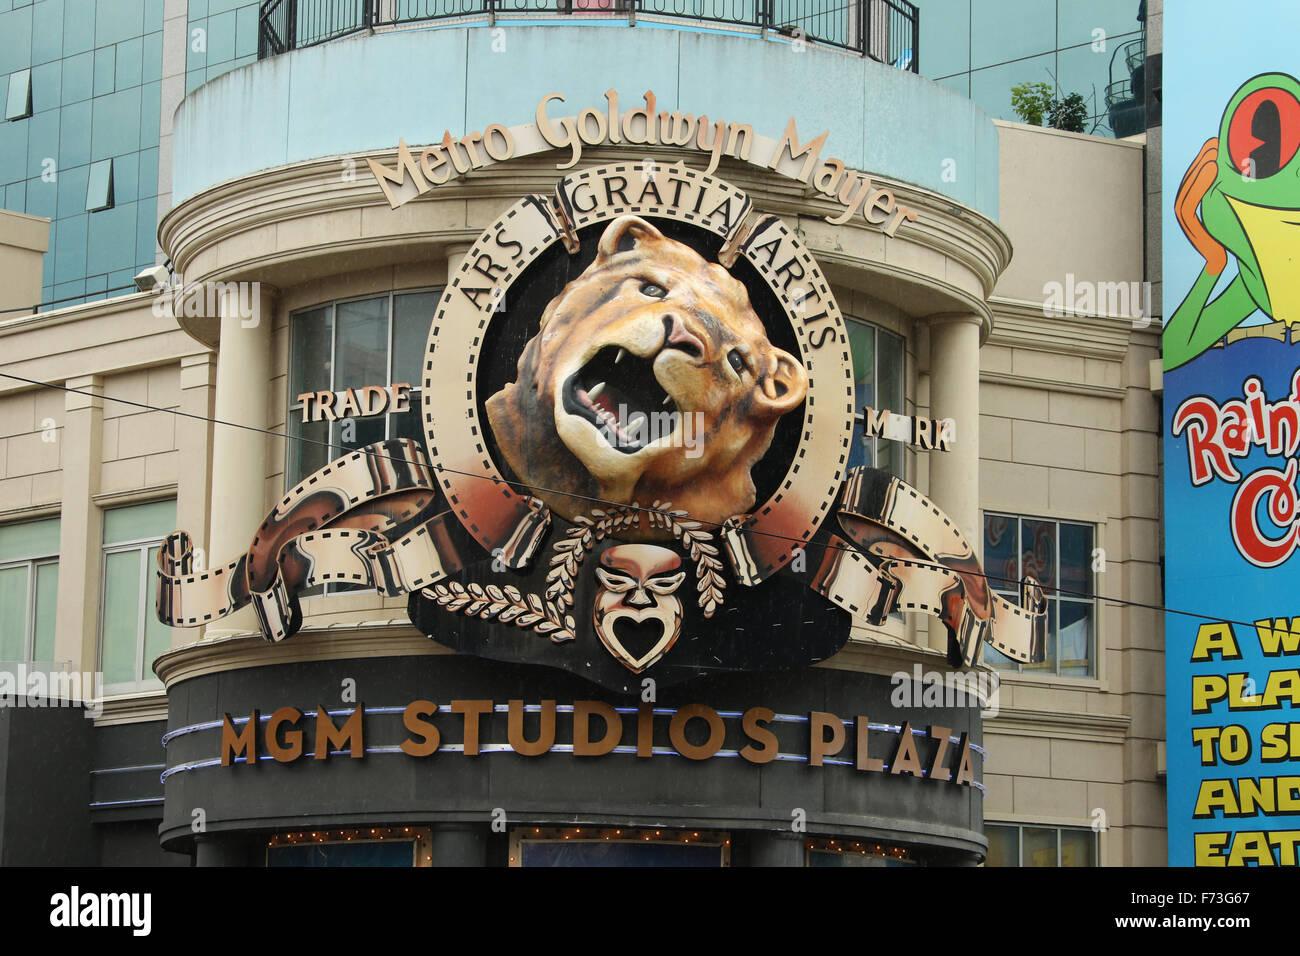 Metro Goldwyn Mayer Mgm Studios Plaza Leo The Lion